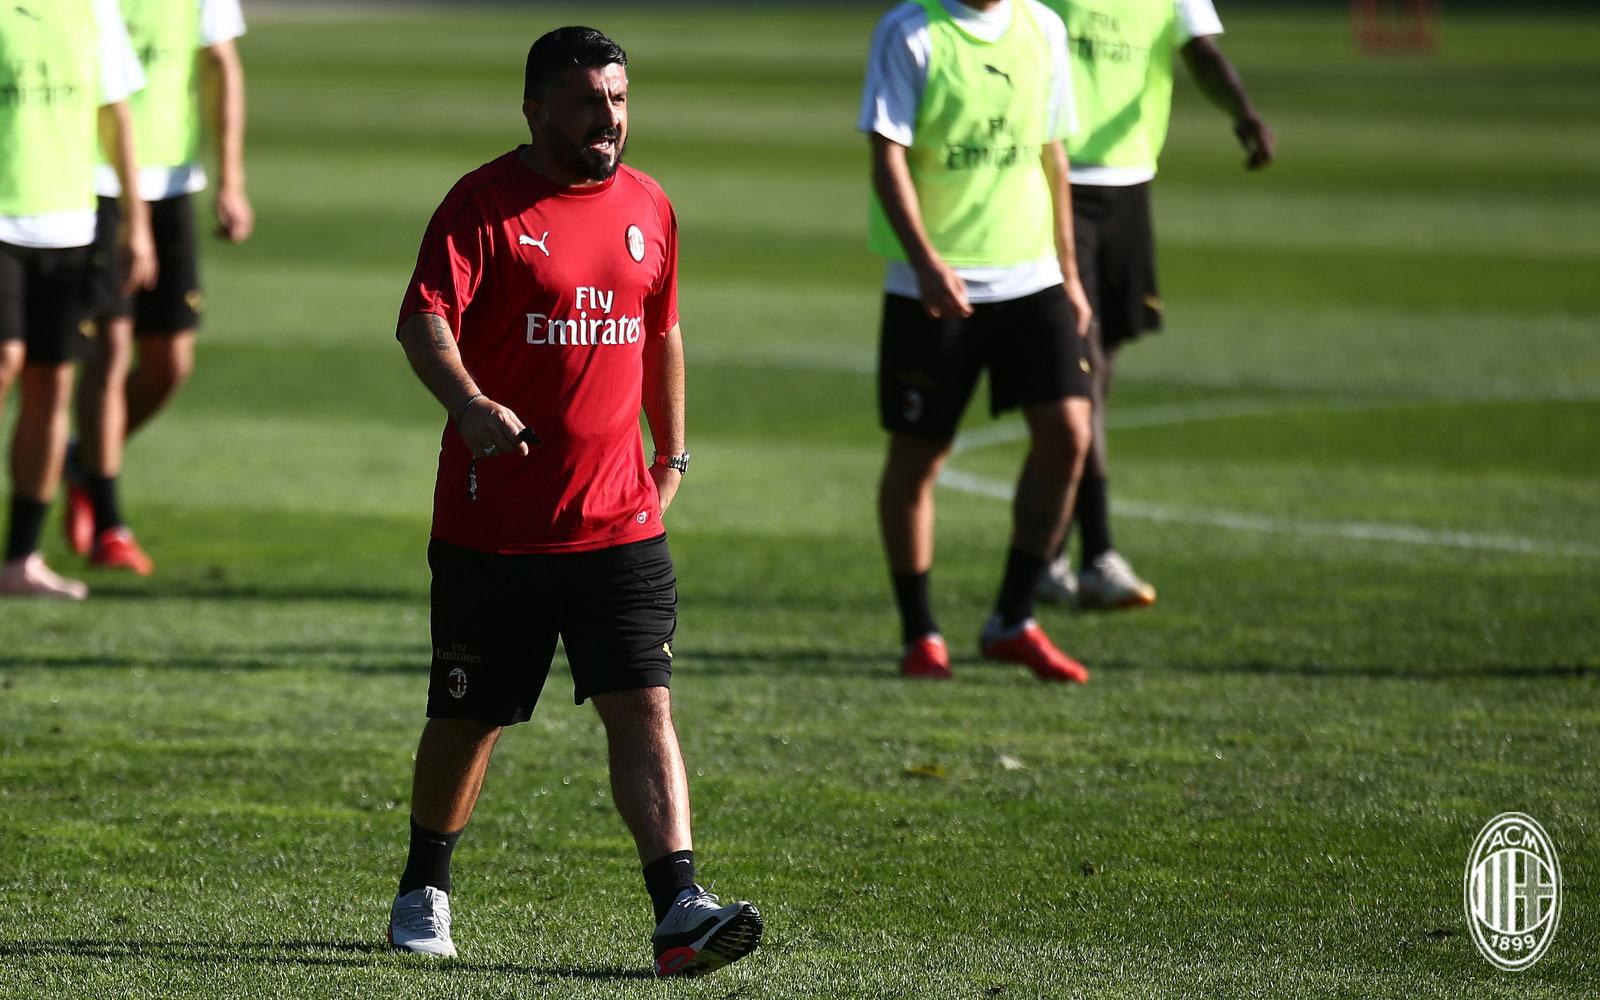 Gennaro Gattuso during training at Milanello. (@acmilan.com)